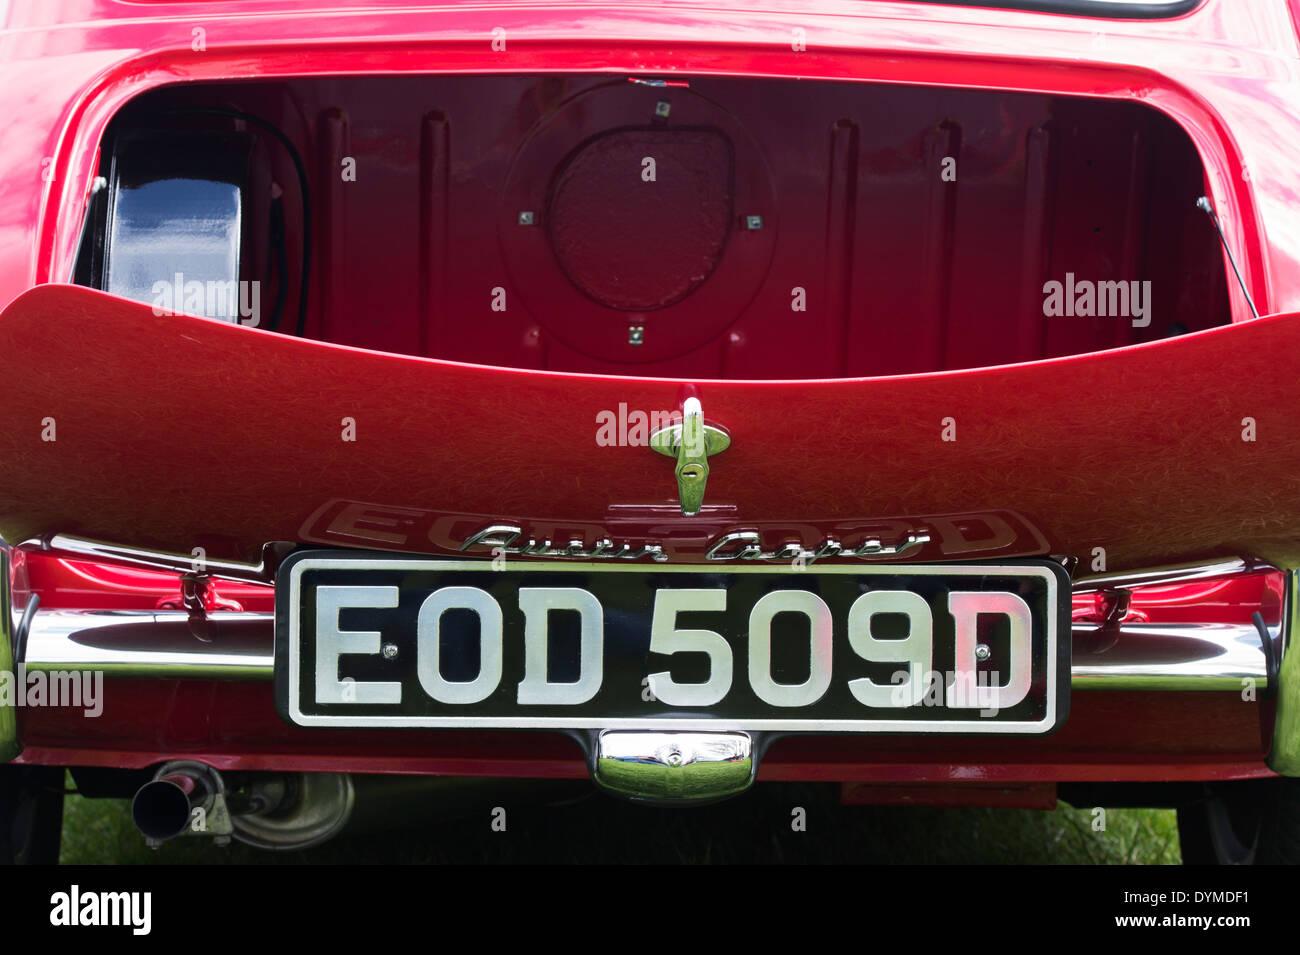 Car Number Plate Uk Stock Photos & Car Number Plate Uk Stock Images ...